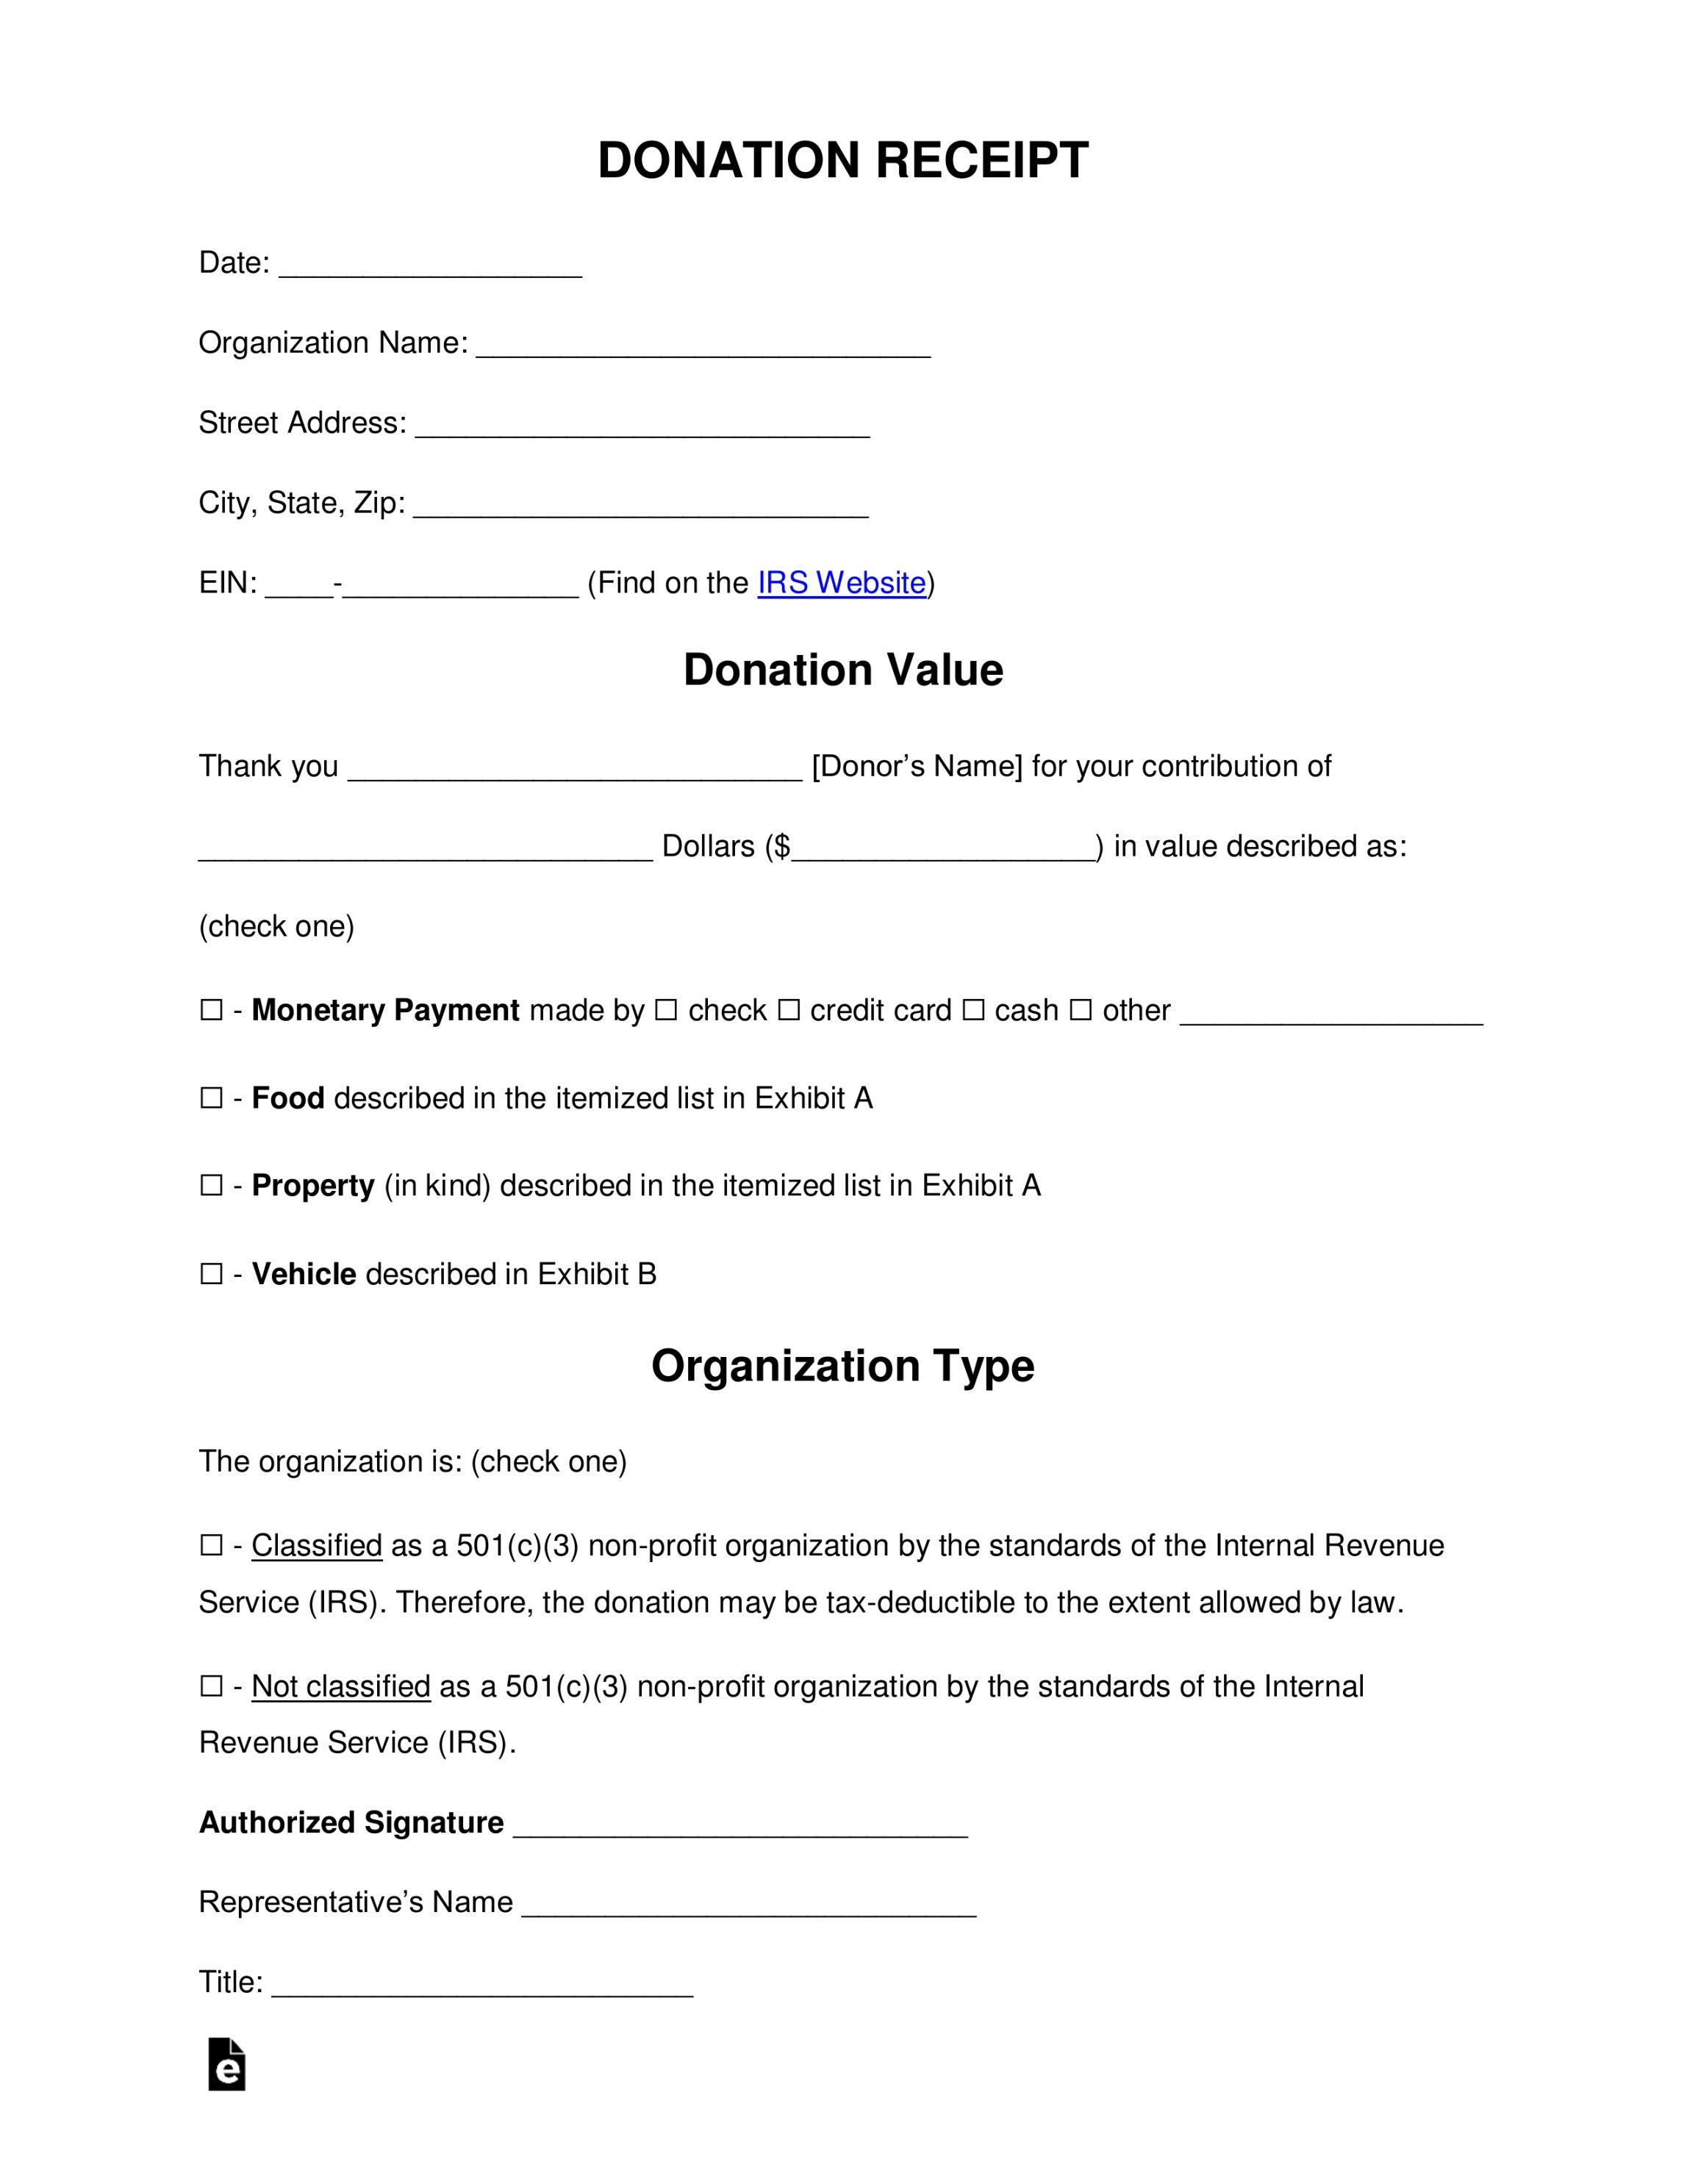 Explore Our Free School Donation Receipt Template Receipt Template Donation Form School Donations